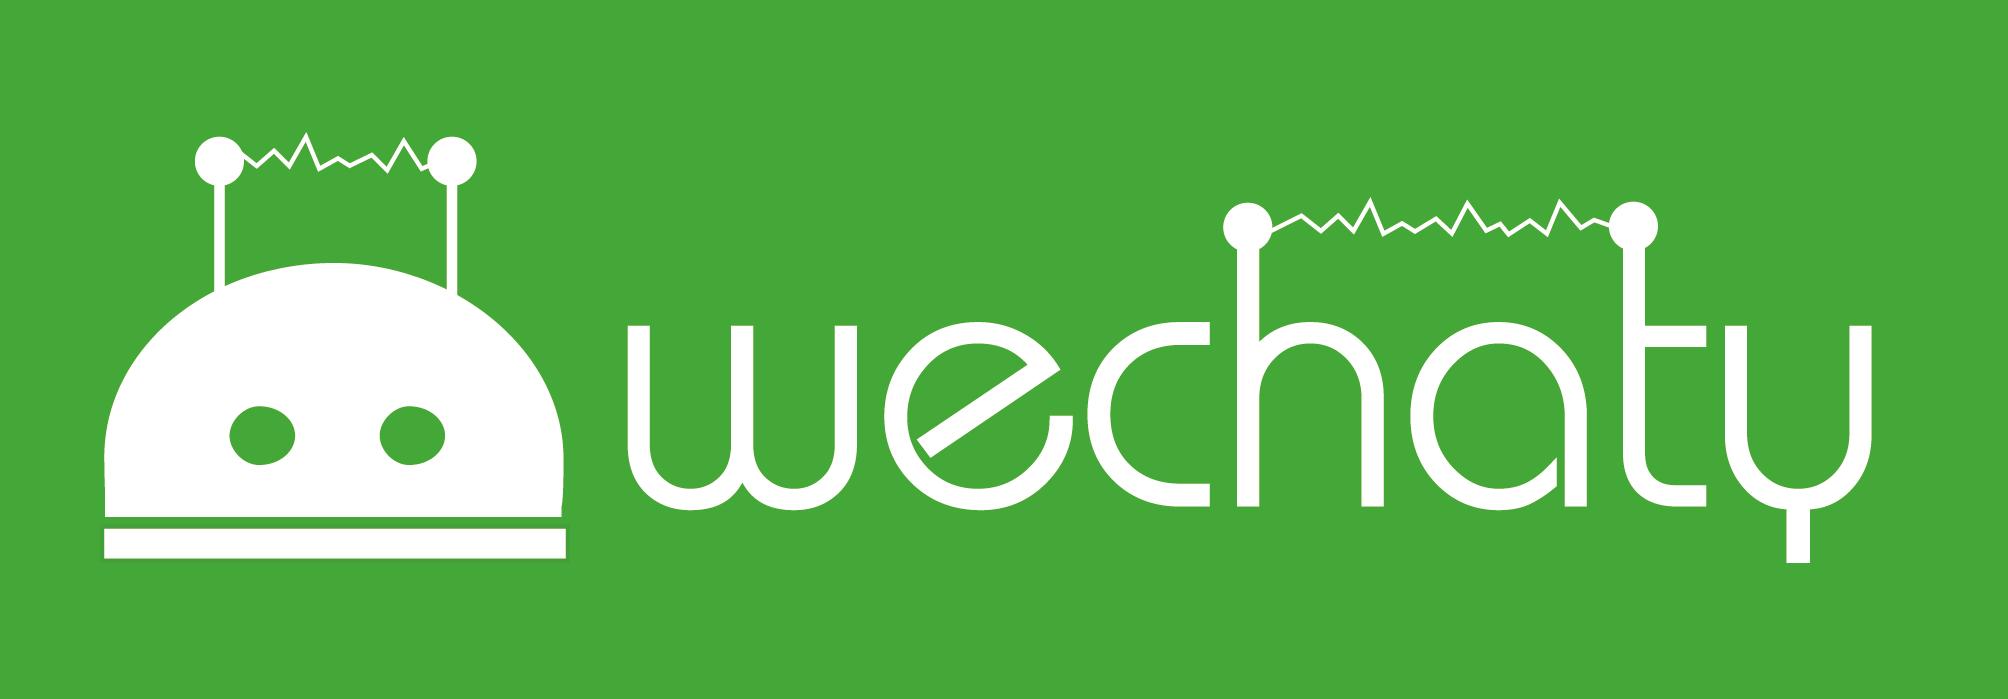 Wechaty